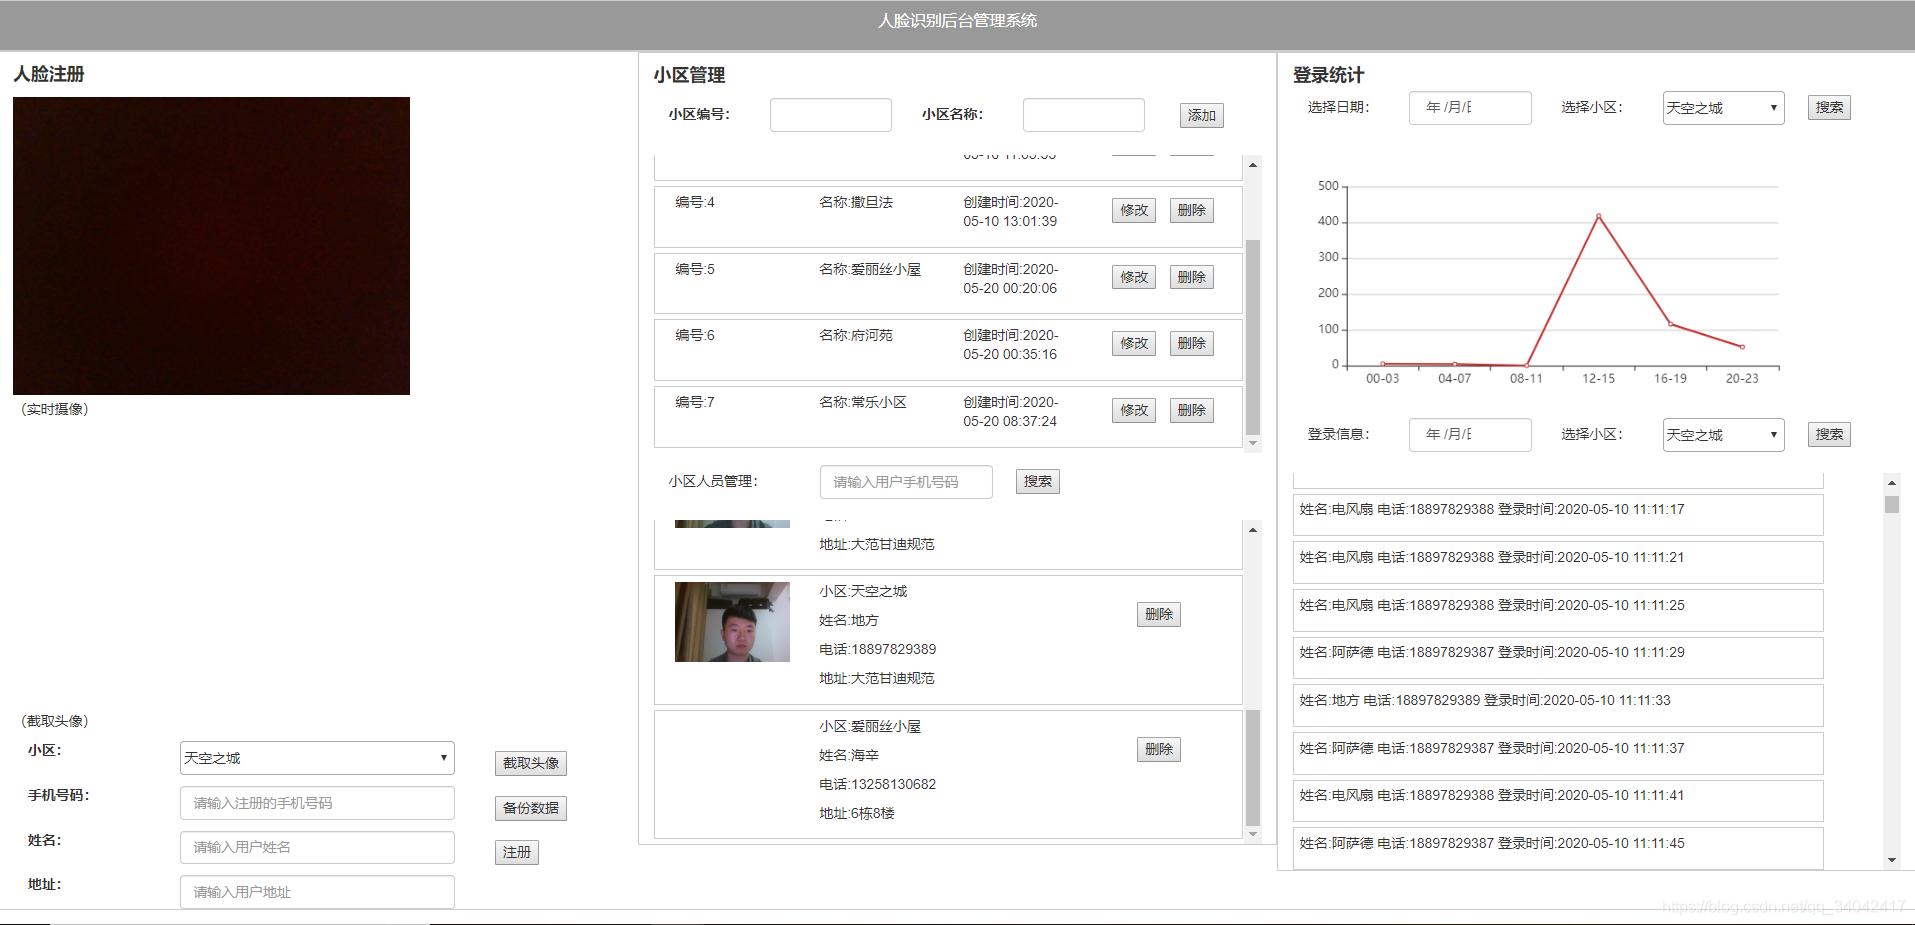 https://img-blog.csdnimg.cn/20200530110950898.png?x-oss-process=image/watermark,type_ZmFuZ3poZW5naGVpdGk,shadow_10,text_aHR0cHM6Ly9ibG9nLmNzZG4ubmV0L3FxXzM0MDQyNDE3,size_16,color_FFFFFF,t_70